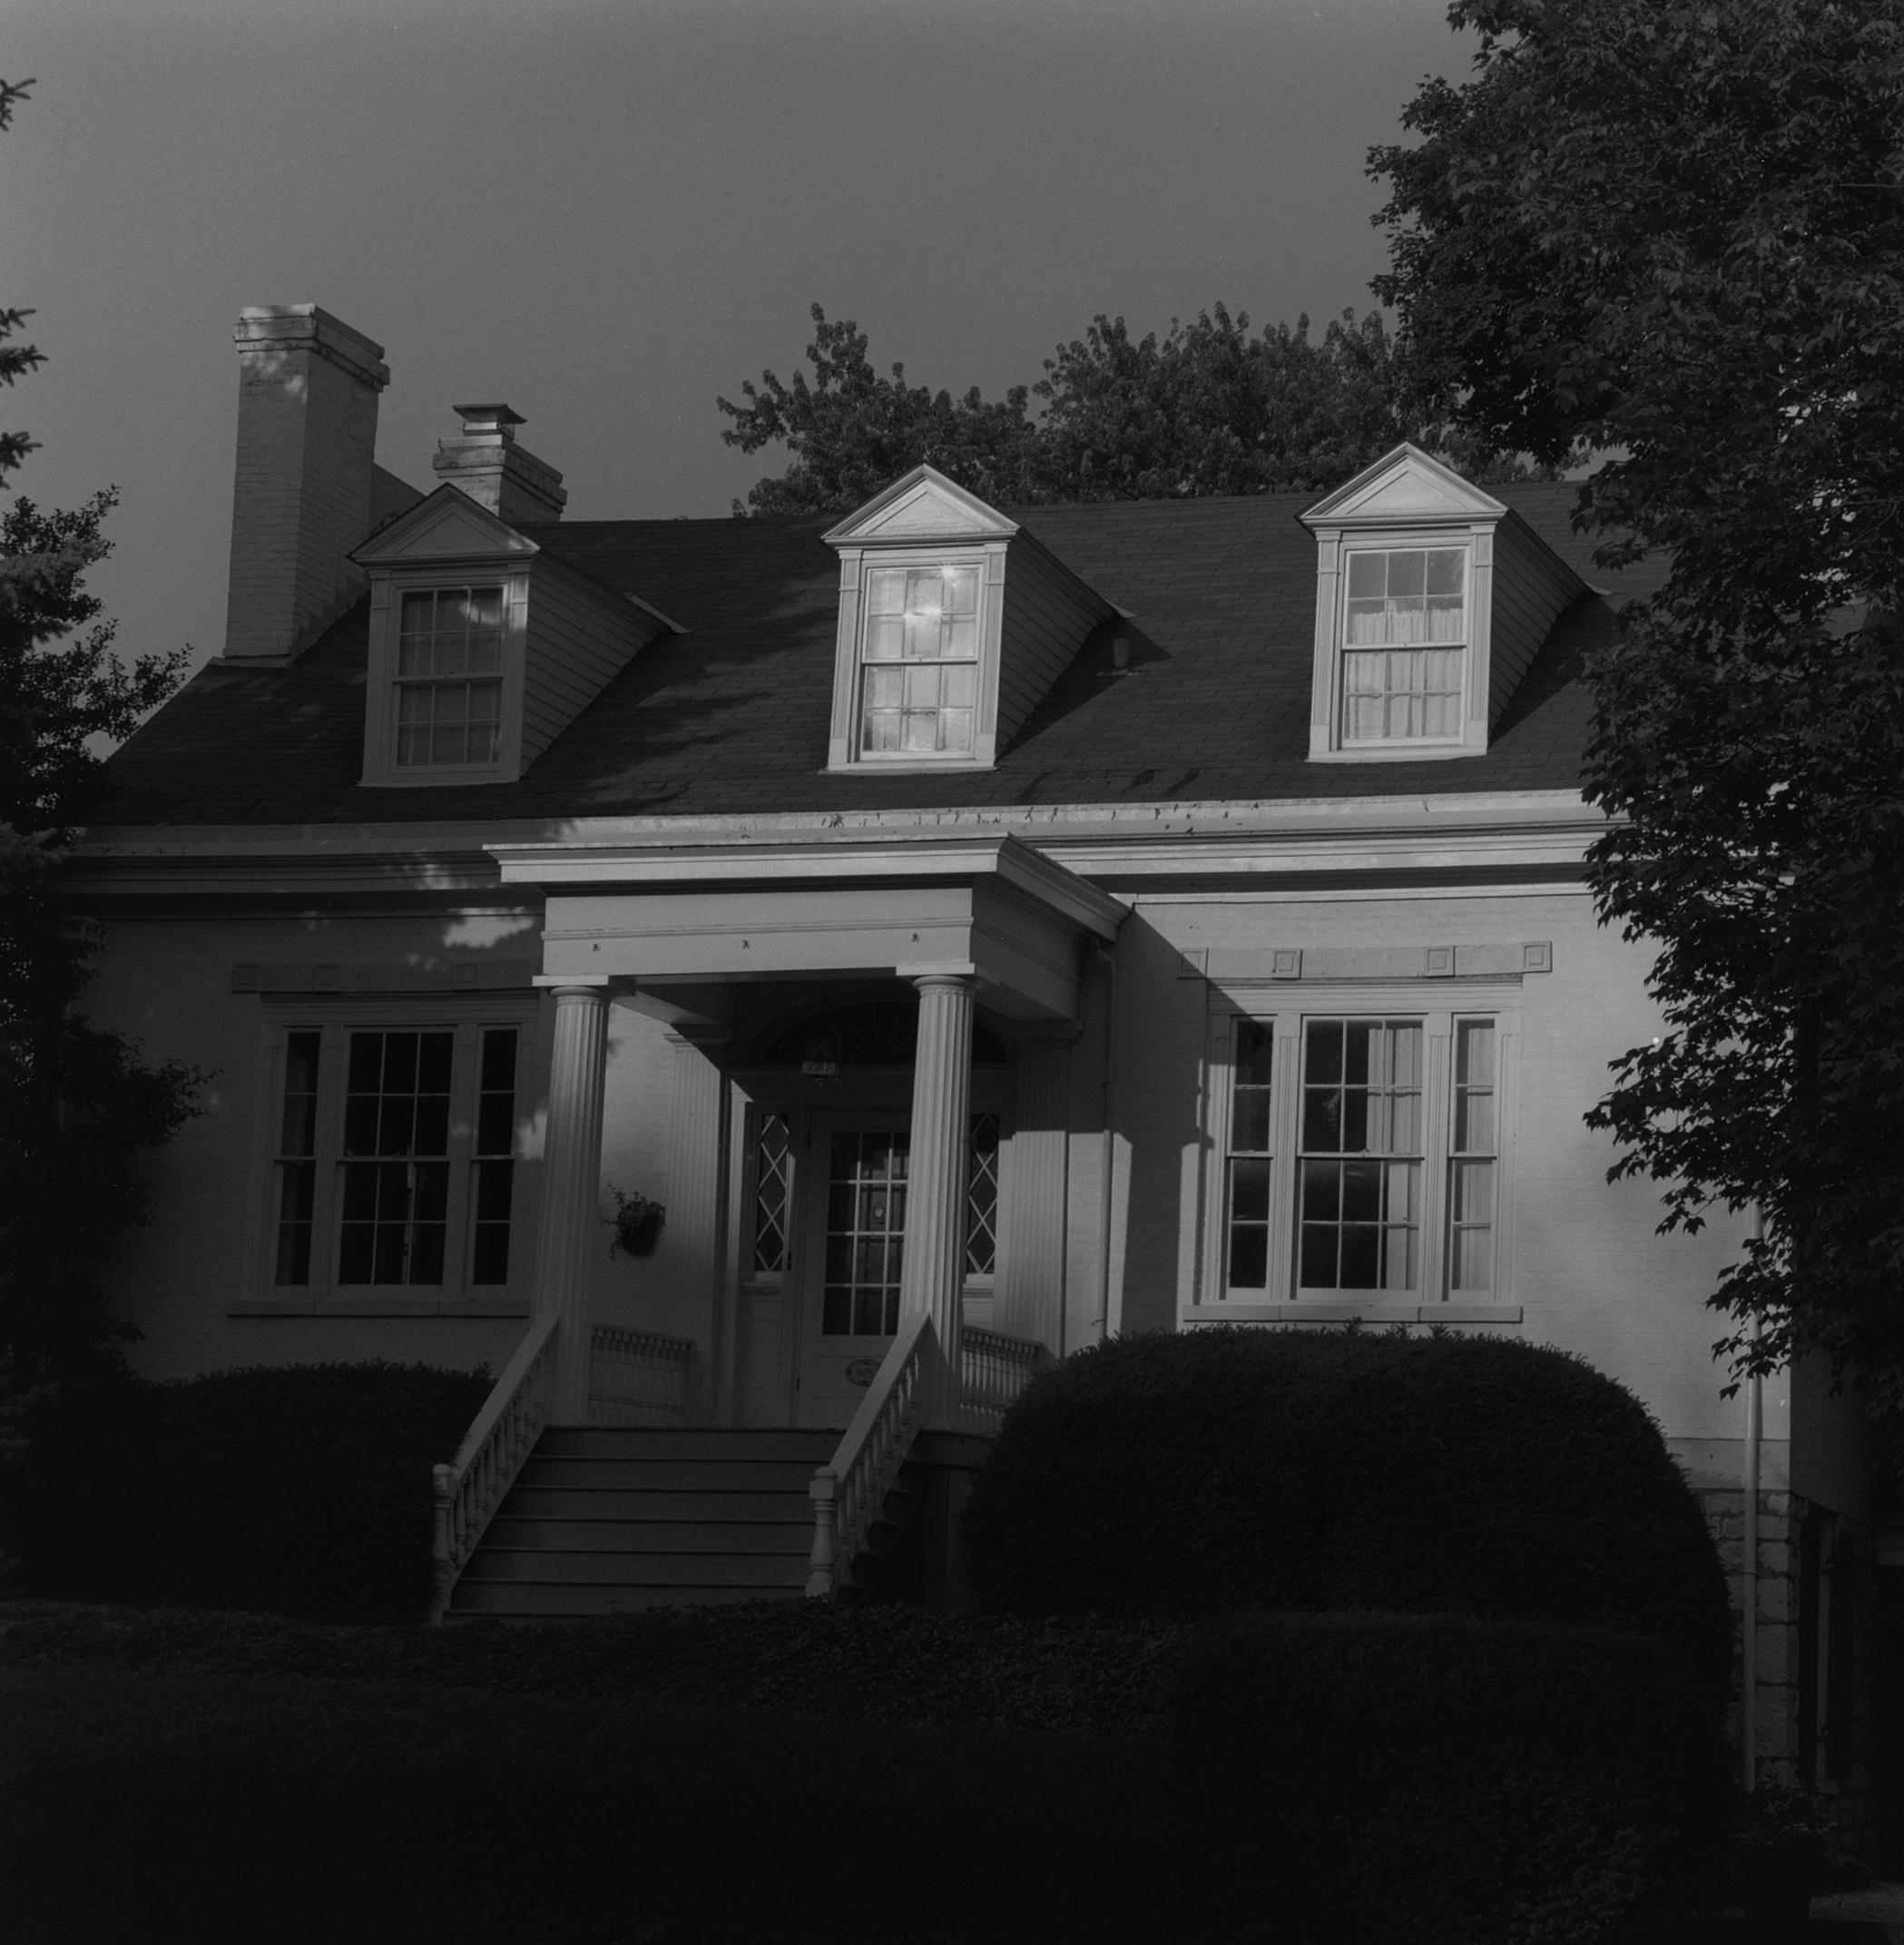 Lyman Trumbull House, Alton, Illinois, 2010